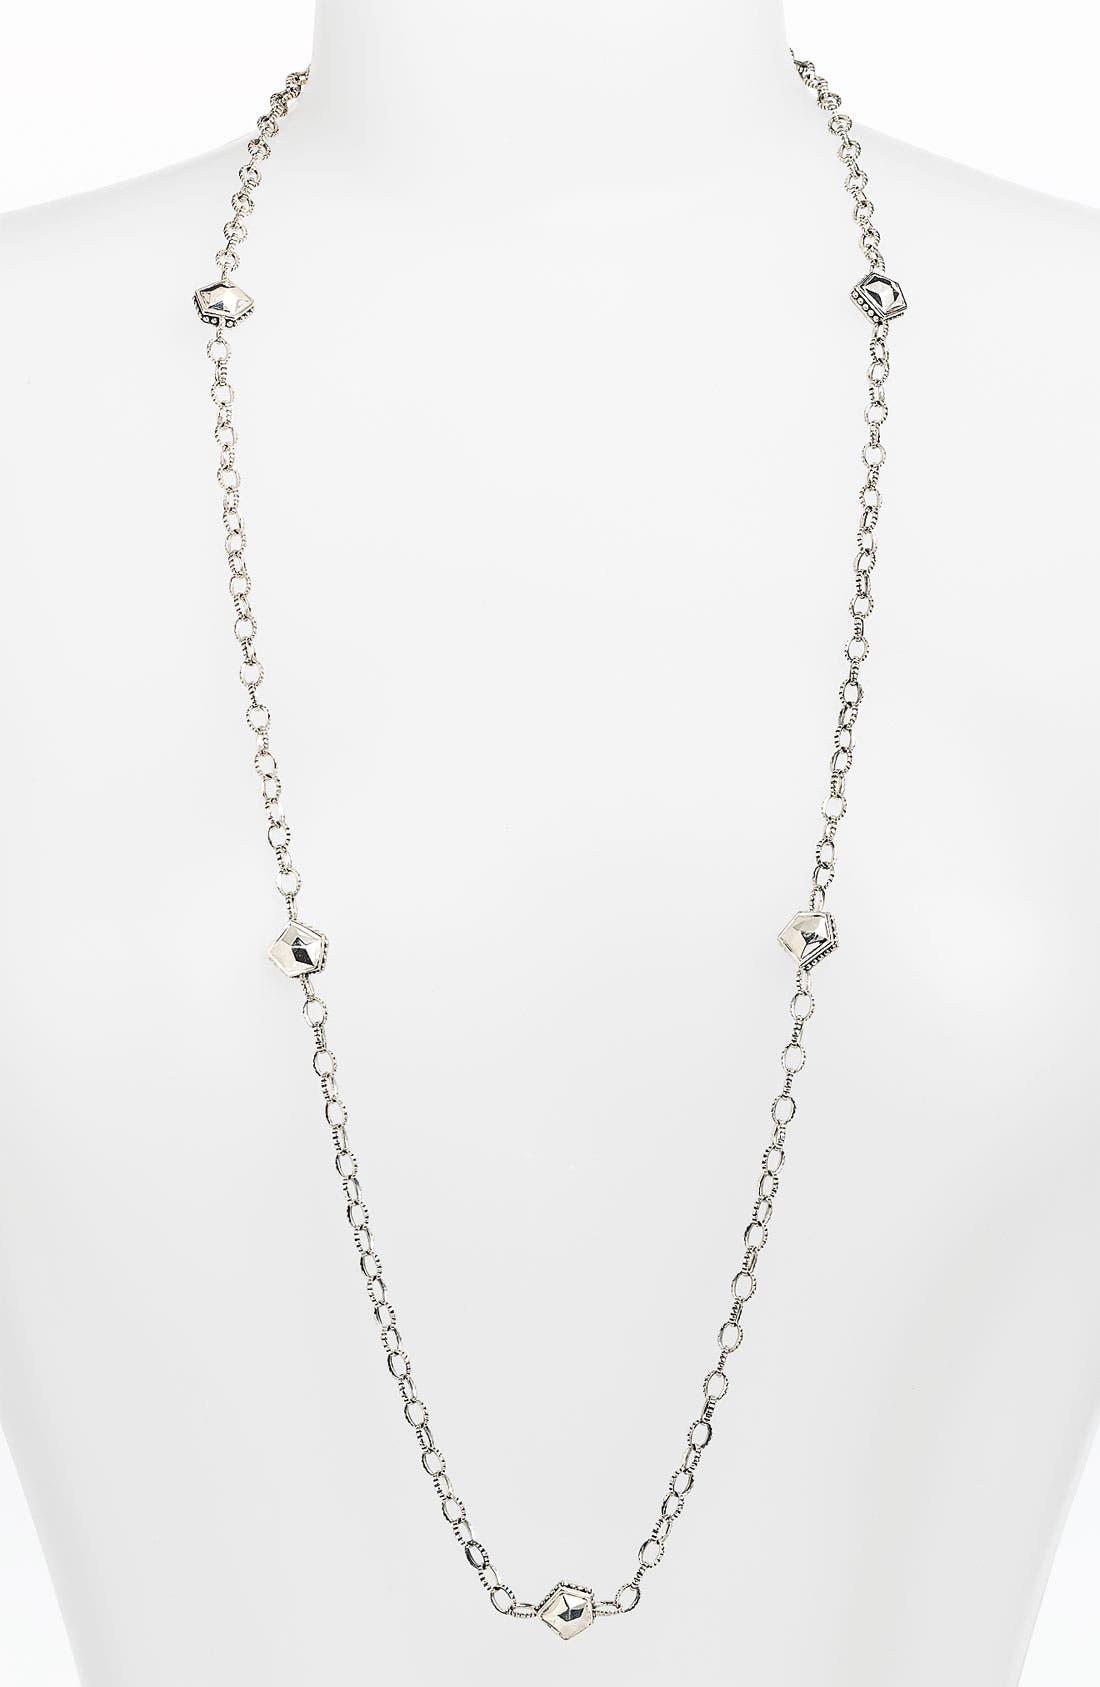 Main Image - LAGOS 'Silver Rocks' Long Station Necklace